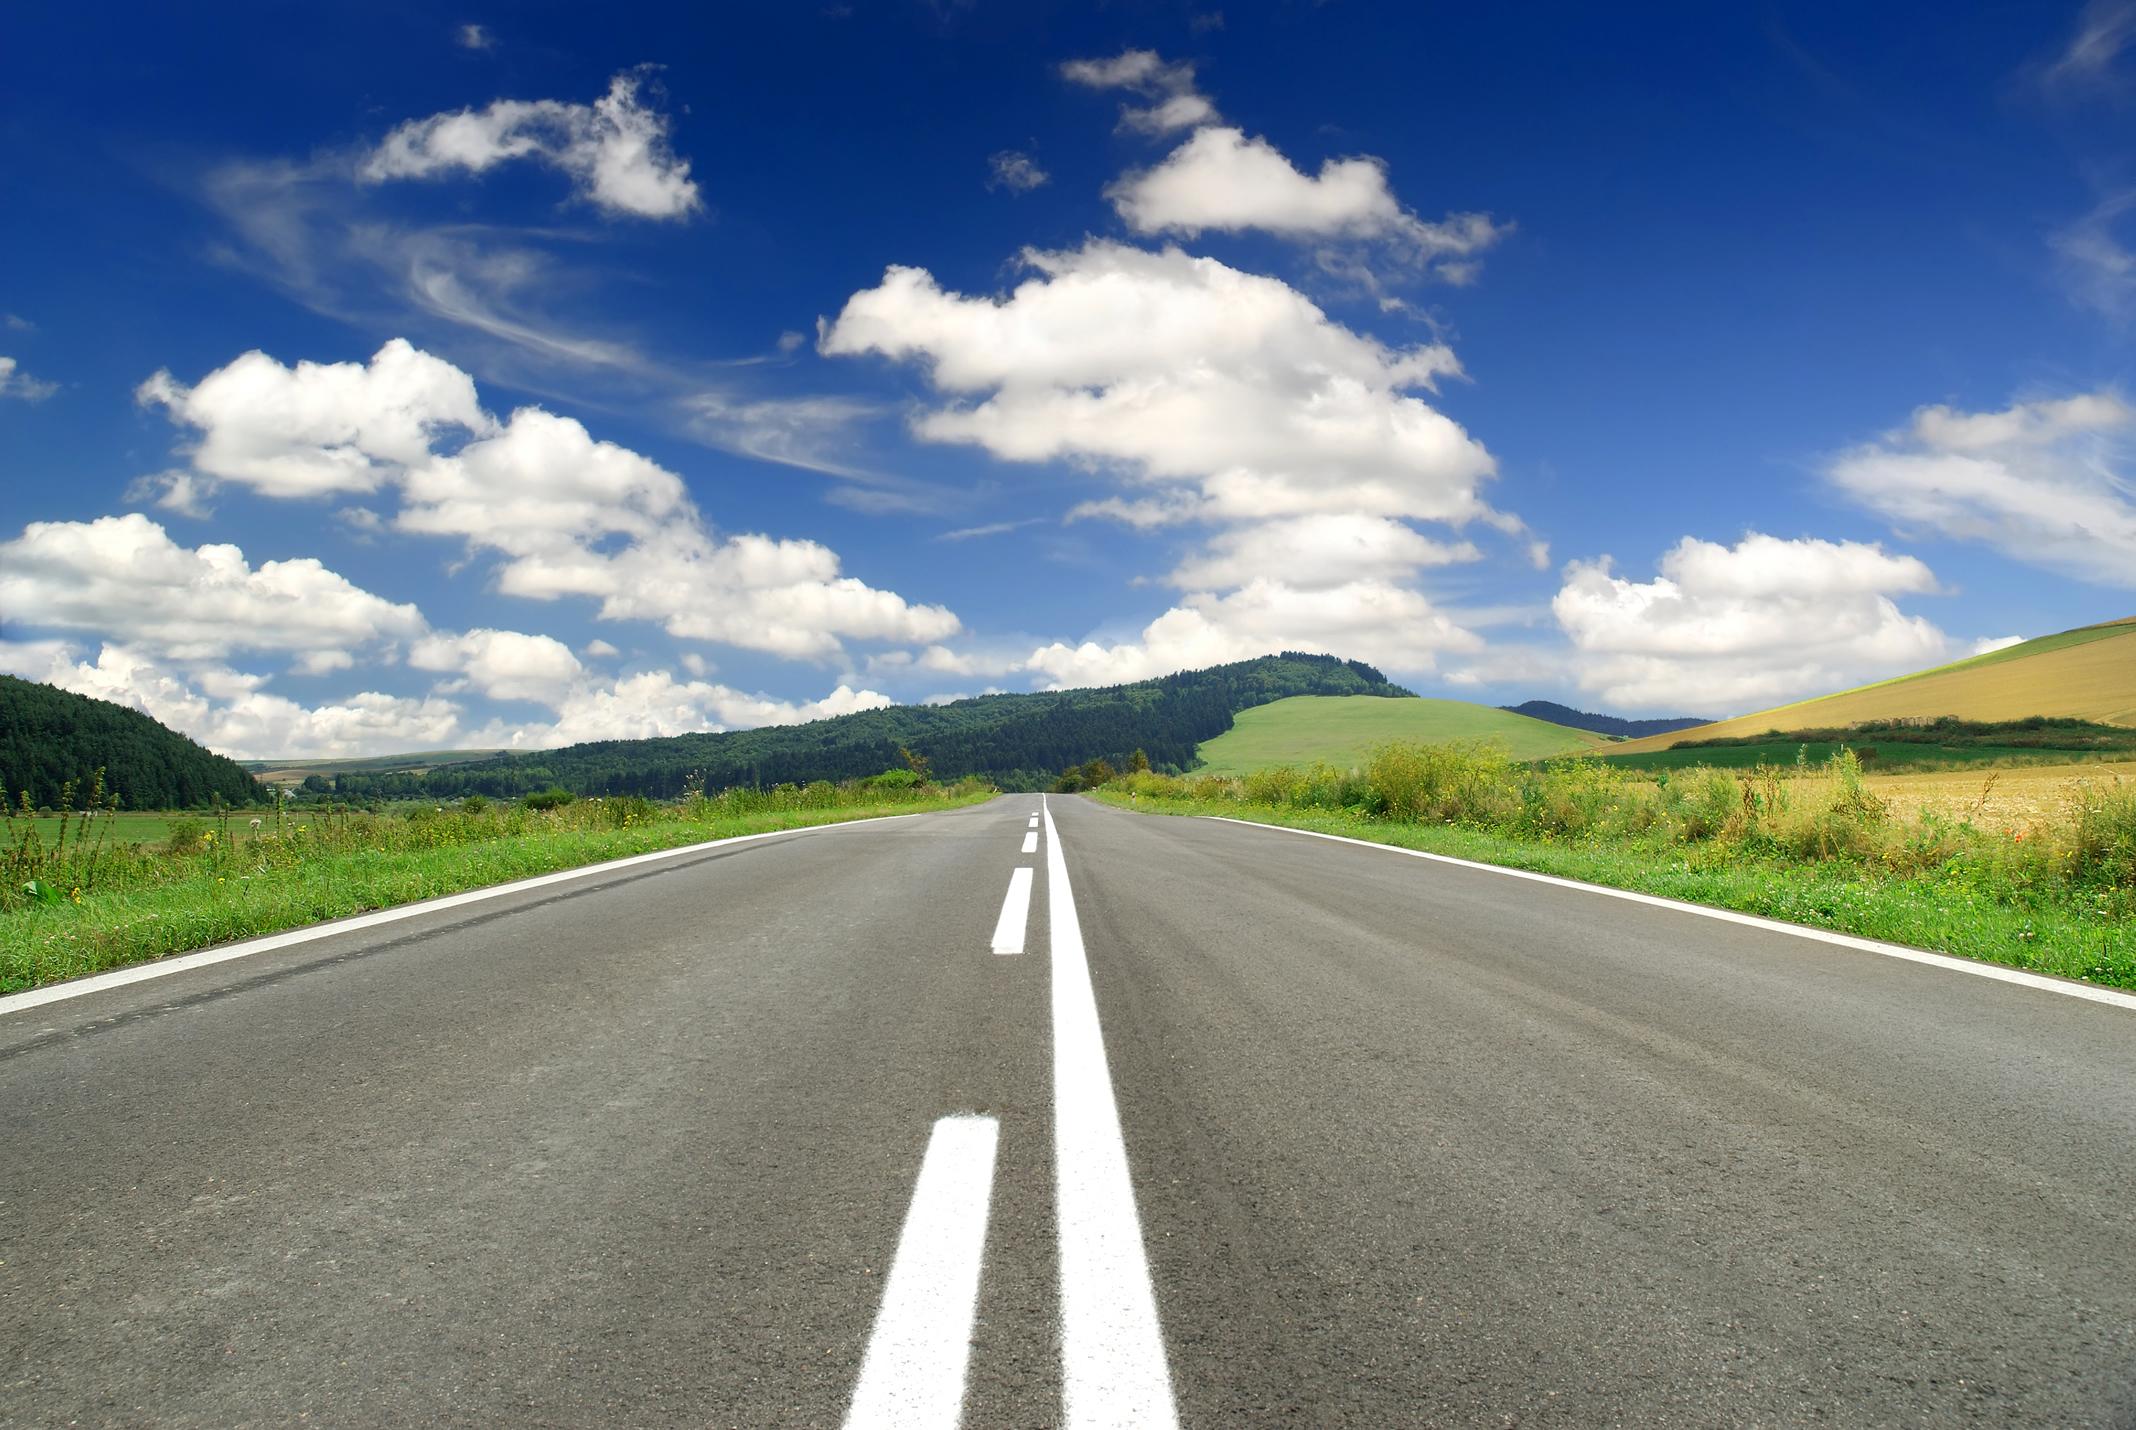 Highway Road Clipart.